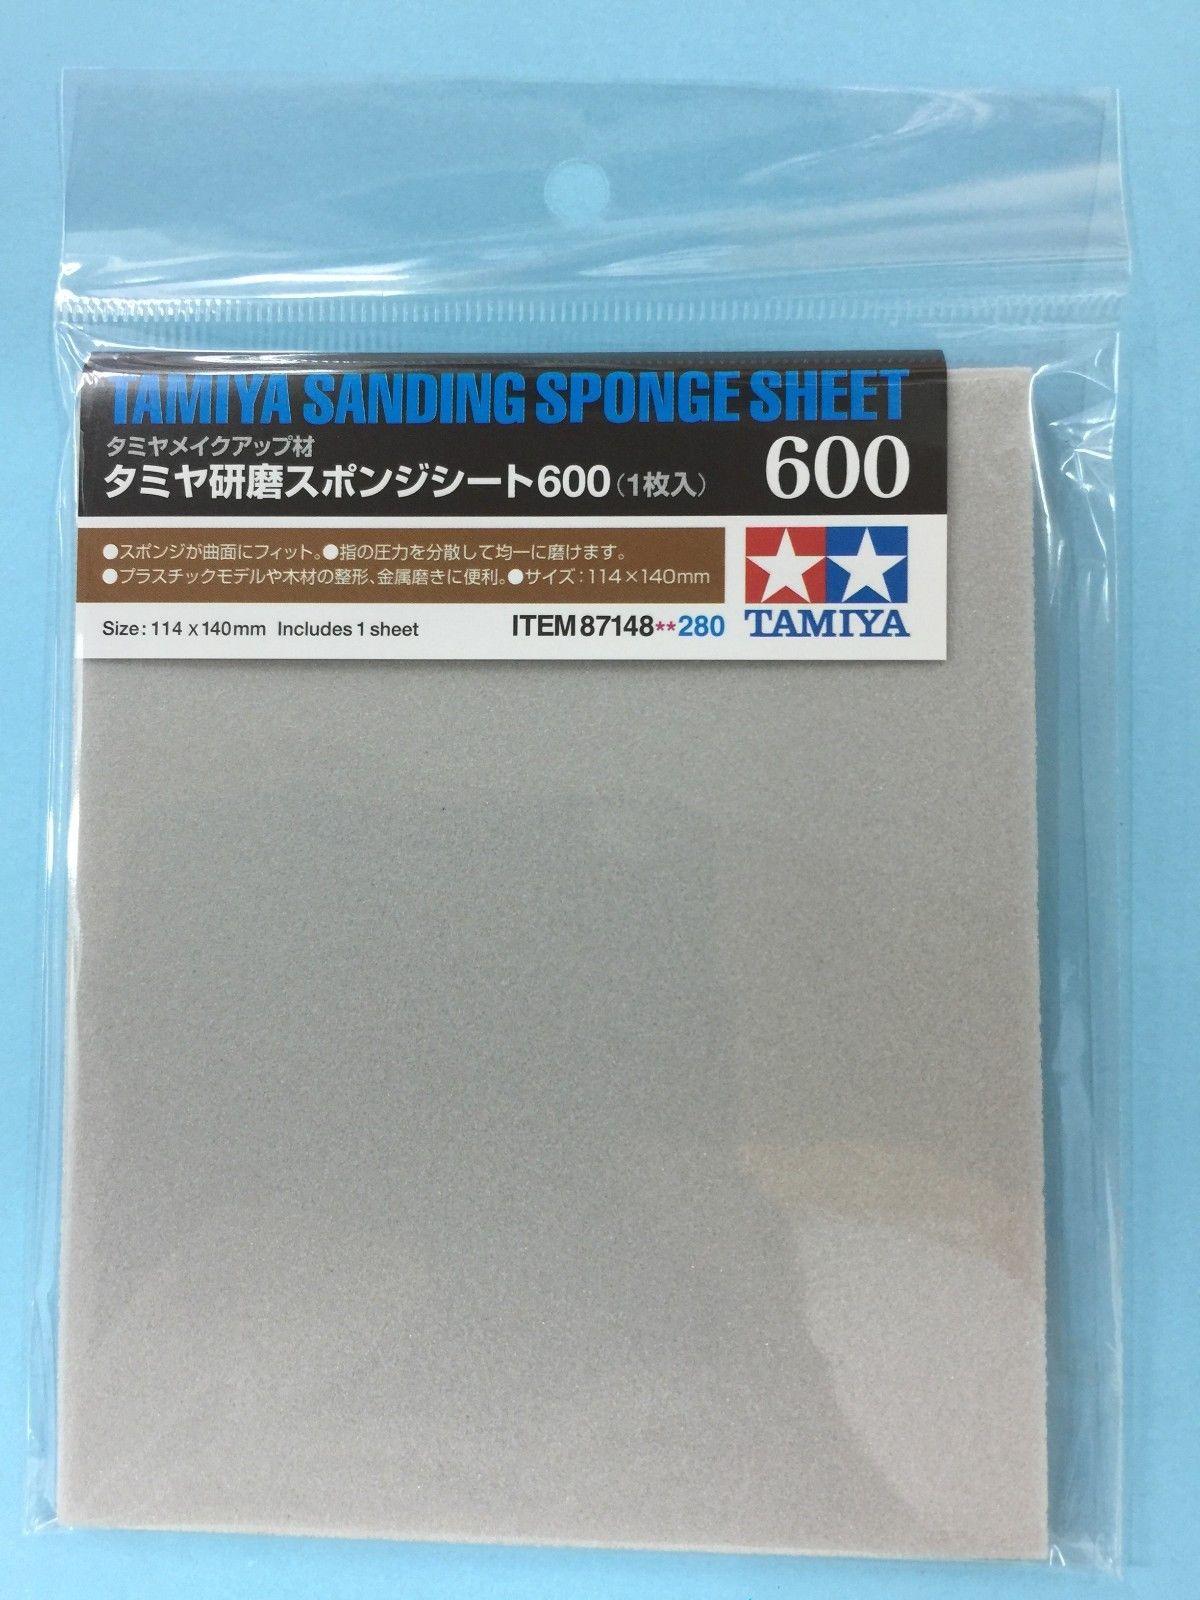 P2000 for Wood Plastic Tamiya Finishing Abrasives Sandpaper Grit Size P180